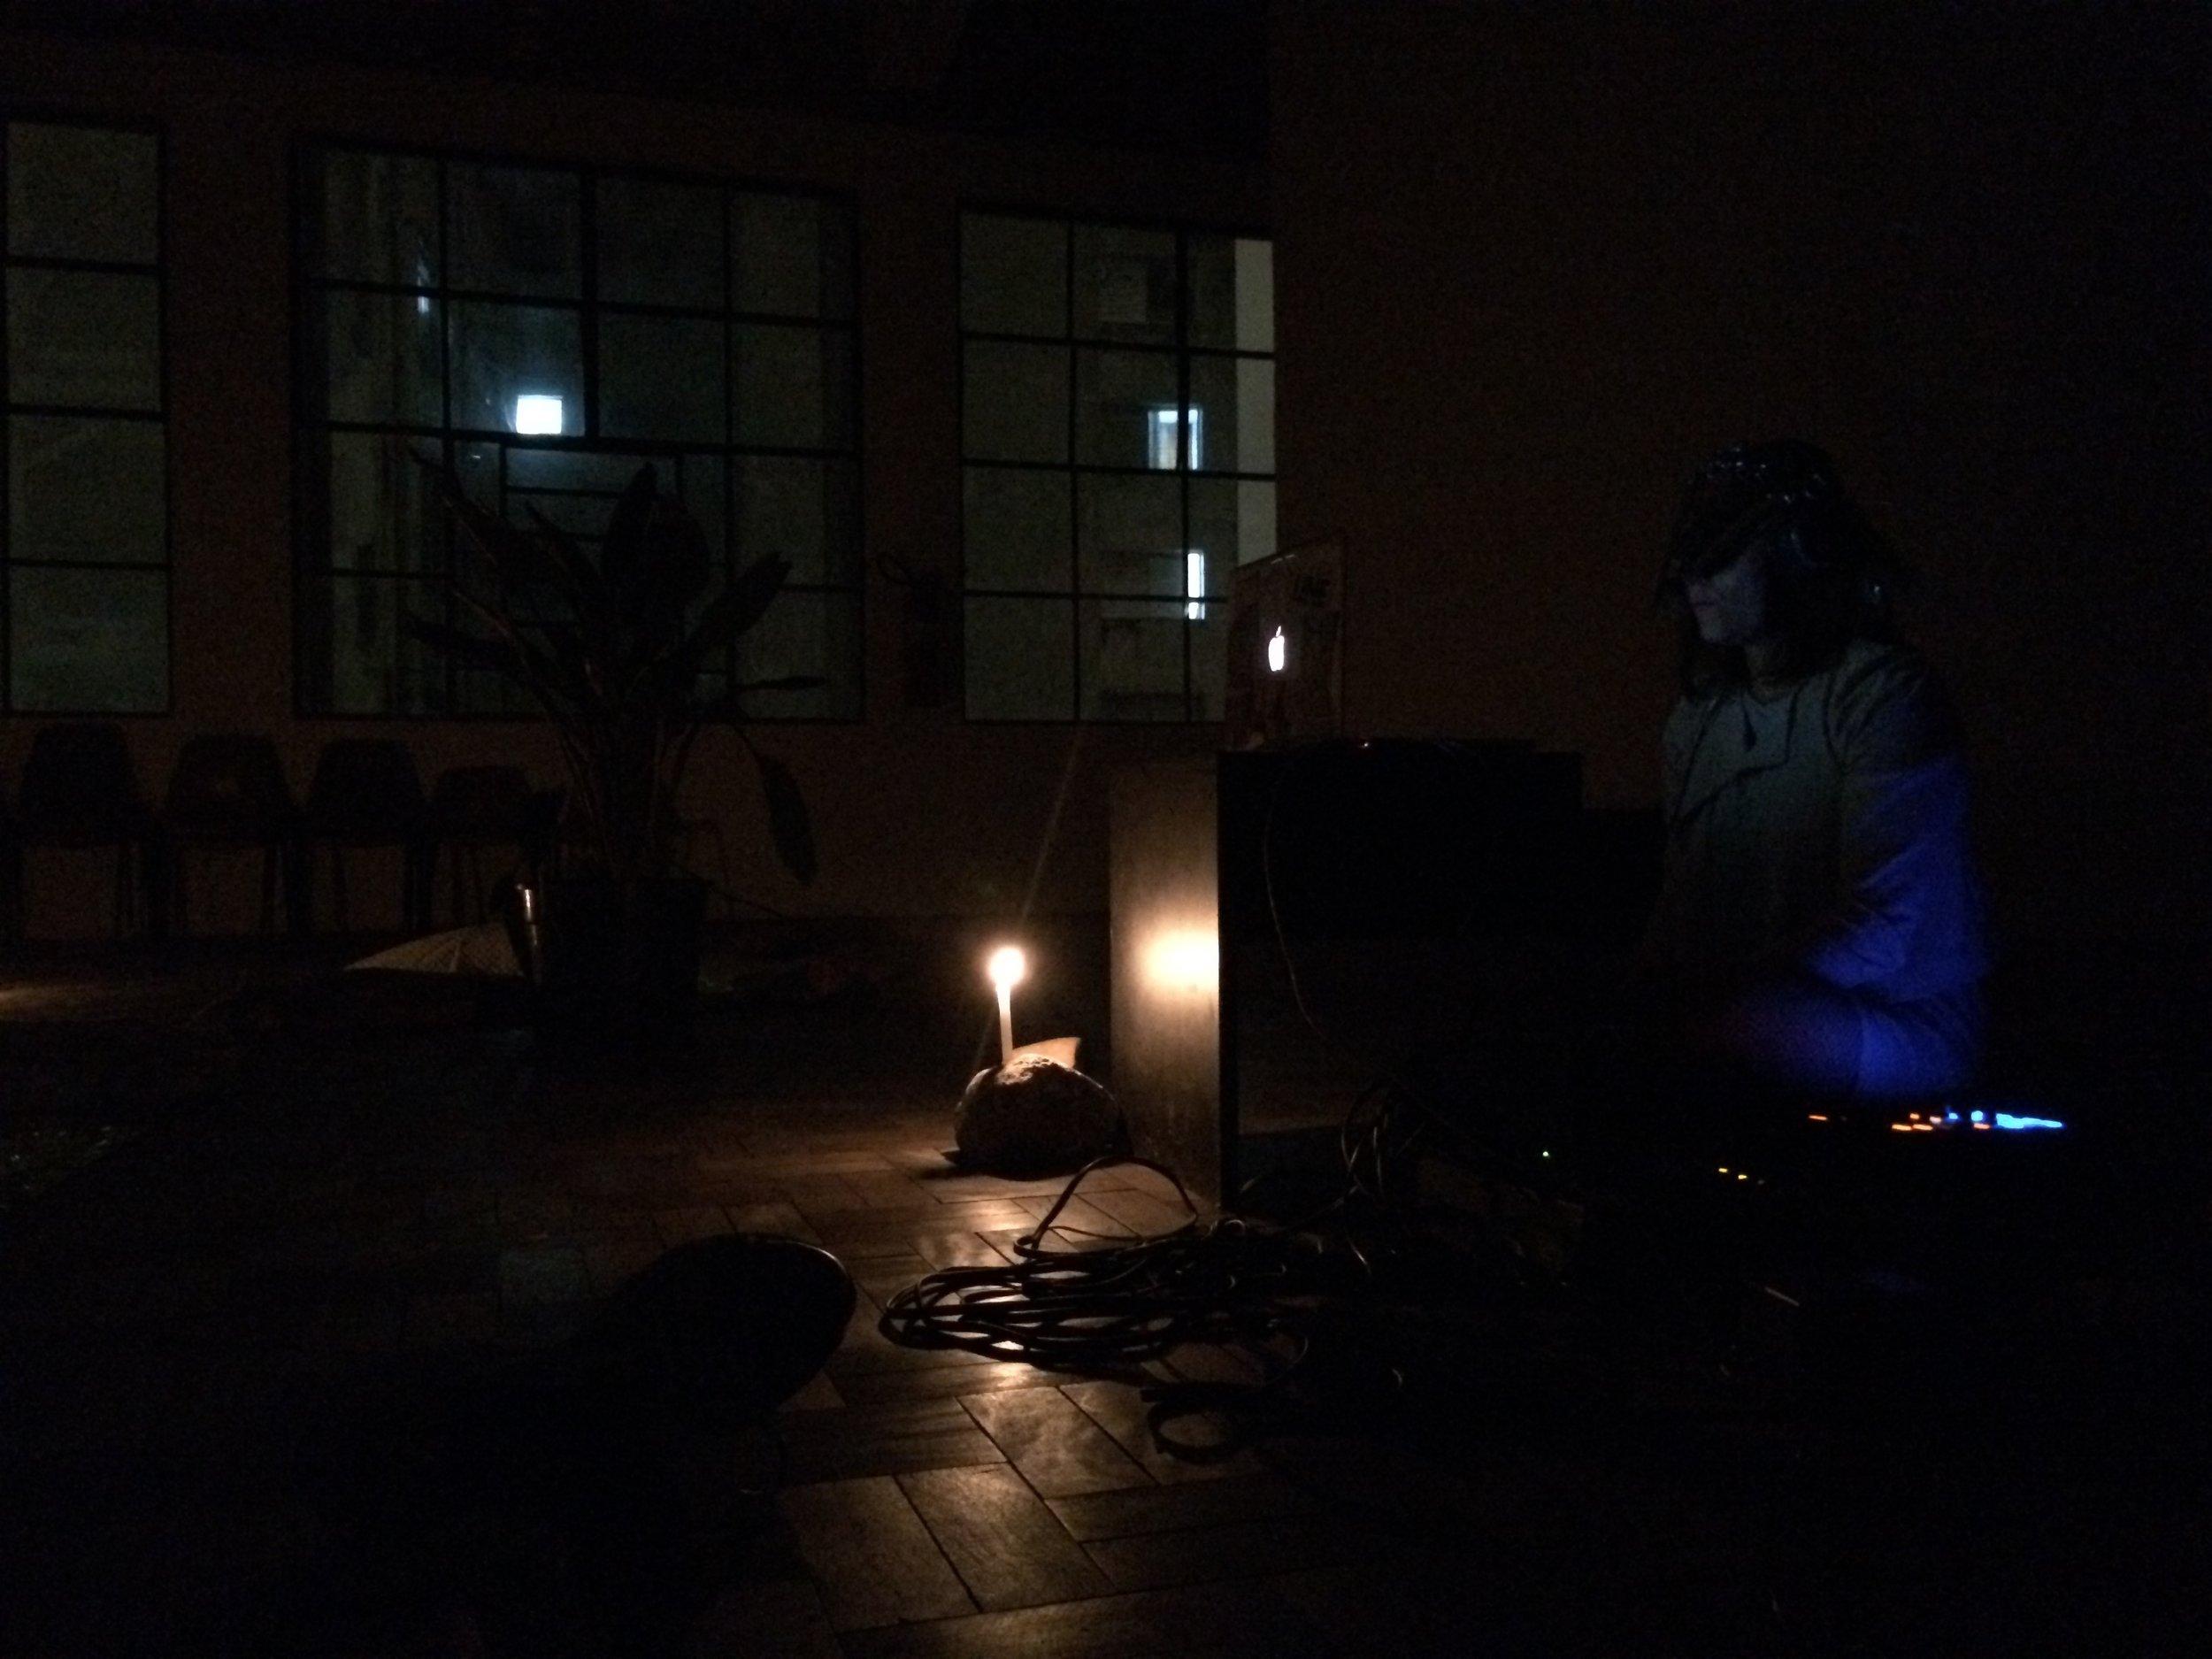 cave music sp - 1 (1).jpg